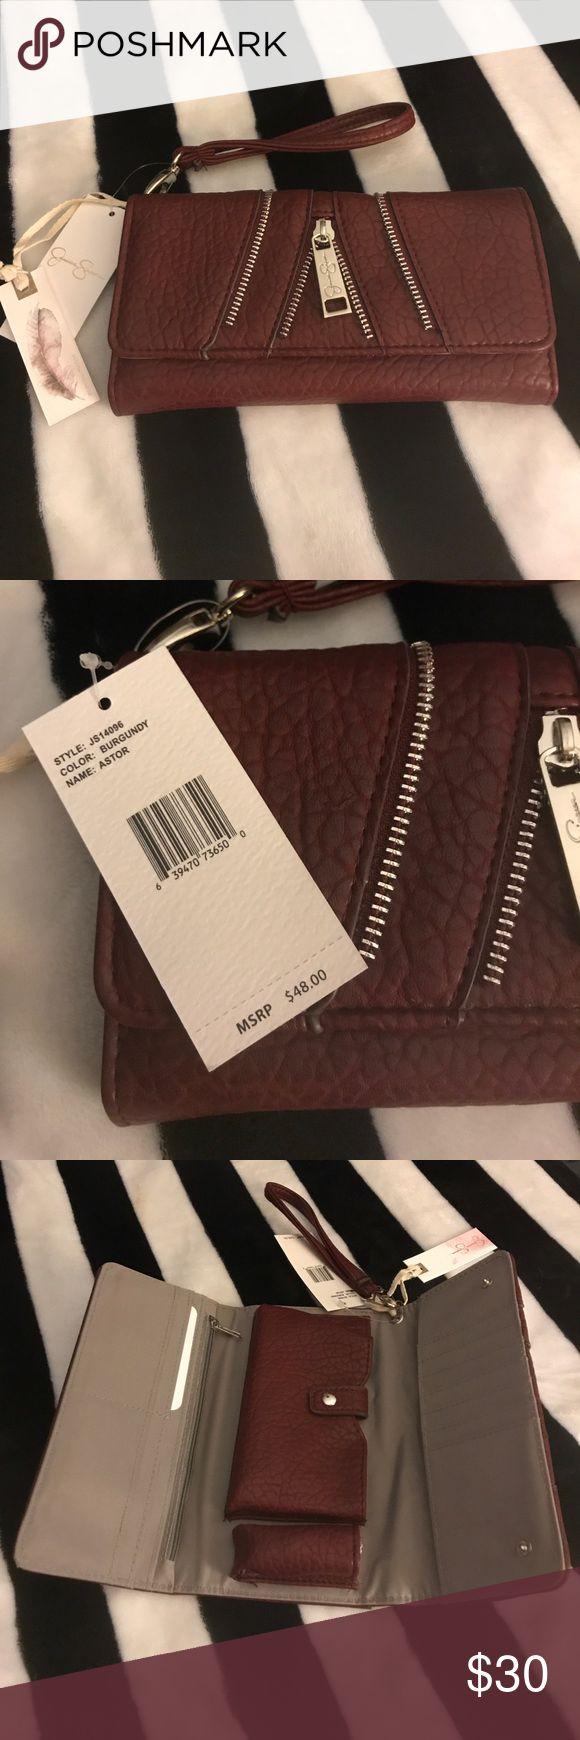 SALE Jessica Simpson Maroon Zipper Wallet ⭐️ Maroon Jessica Simpson Wallet. Brand New with Tags. Cute Zipper Design! Love Love Love This One! ❤️ Jessica Simpson Bags Wallets